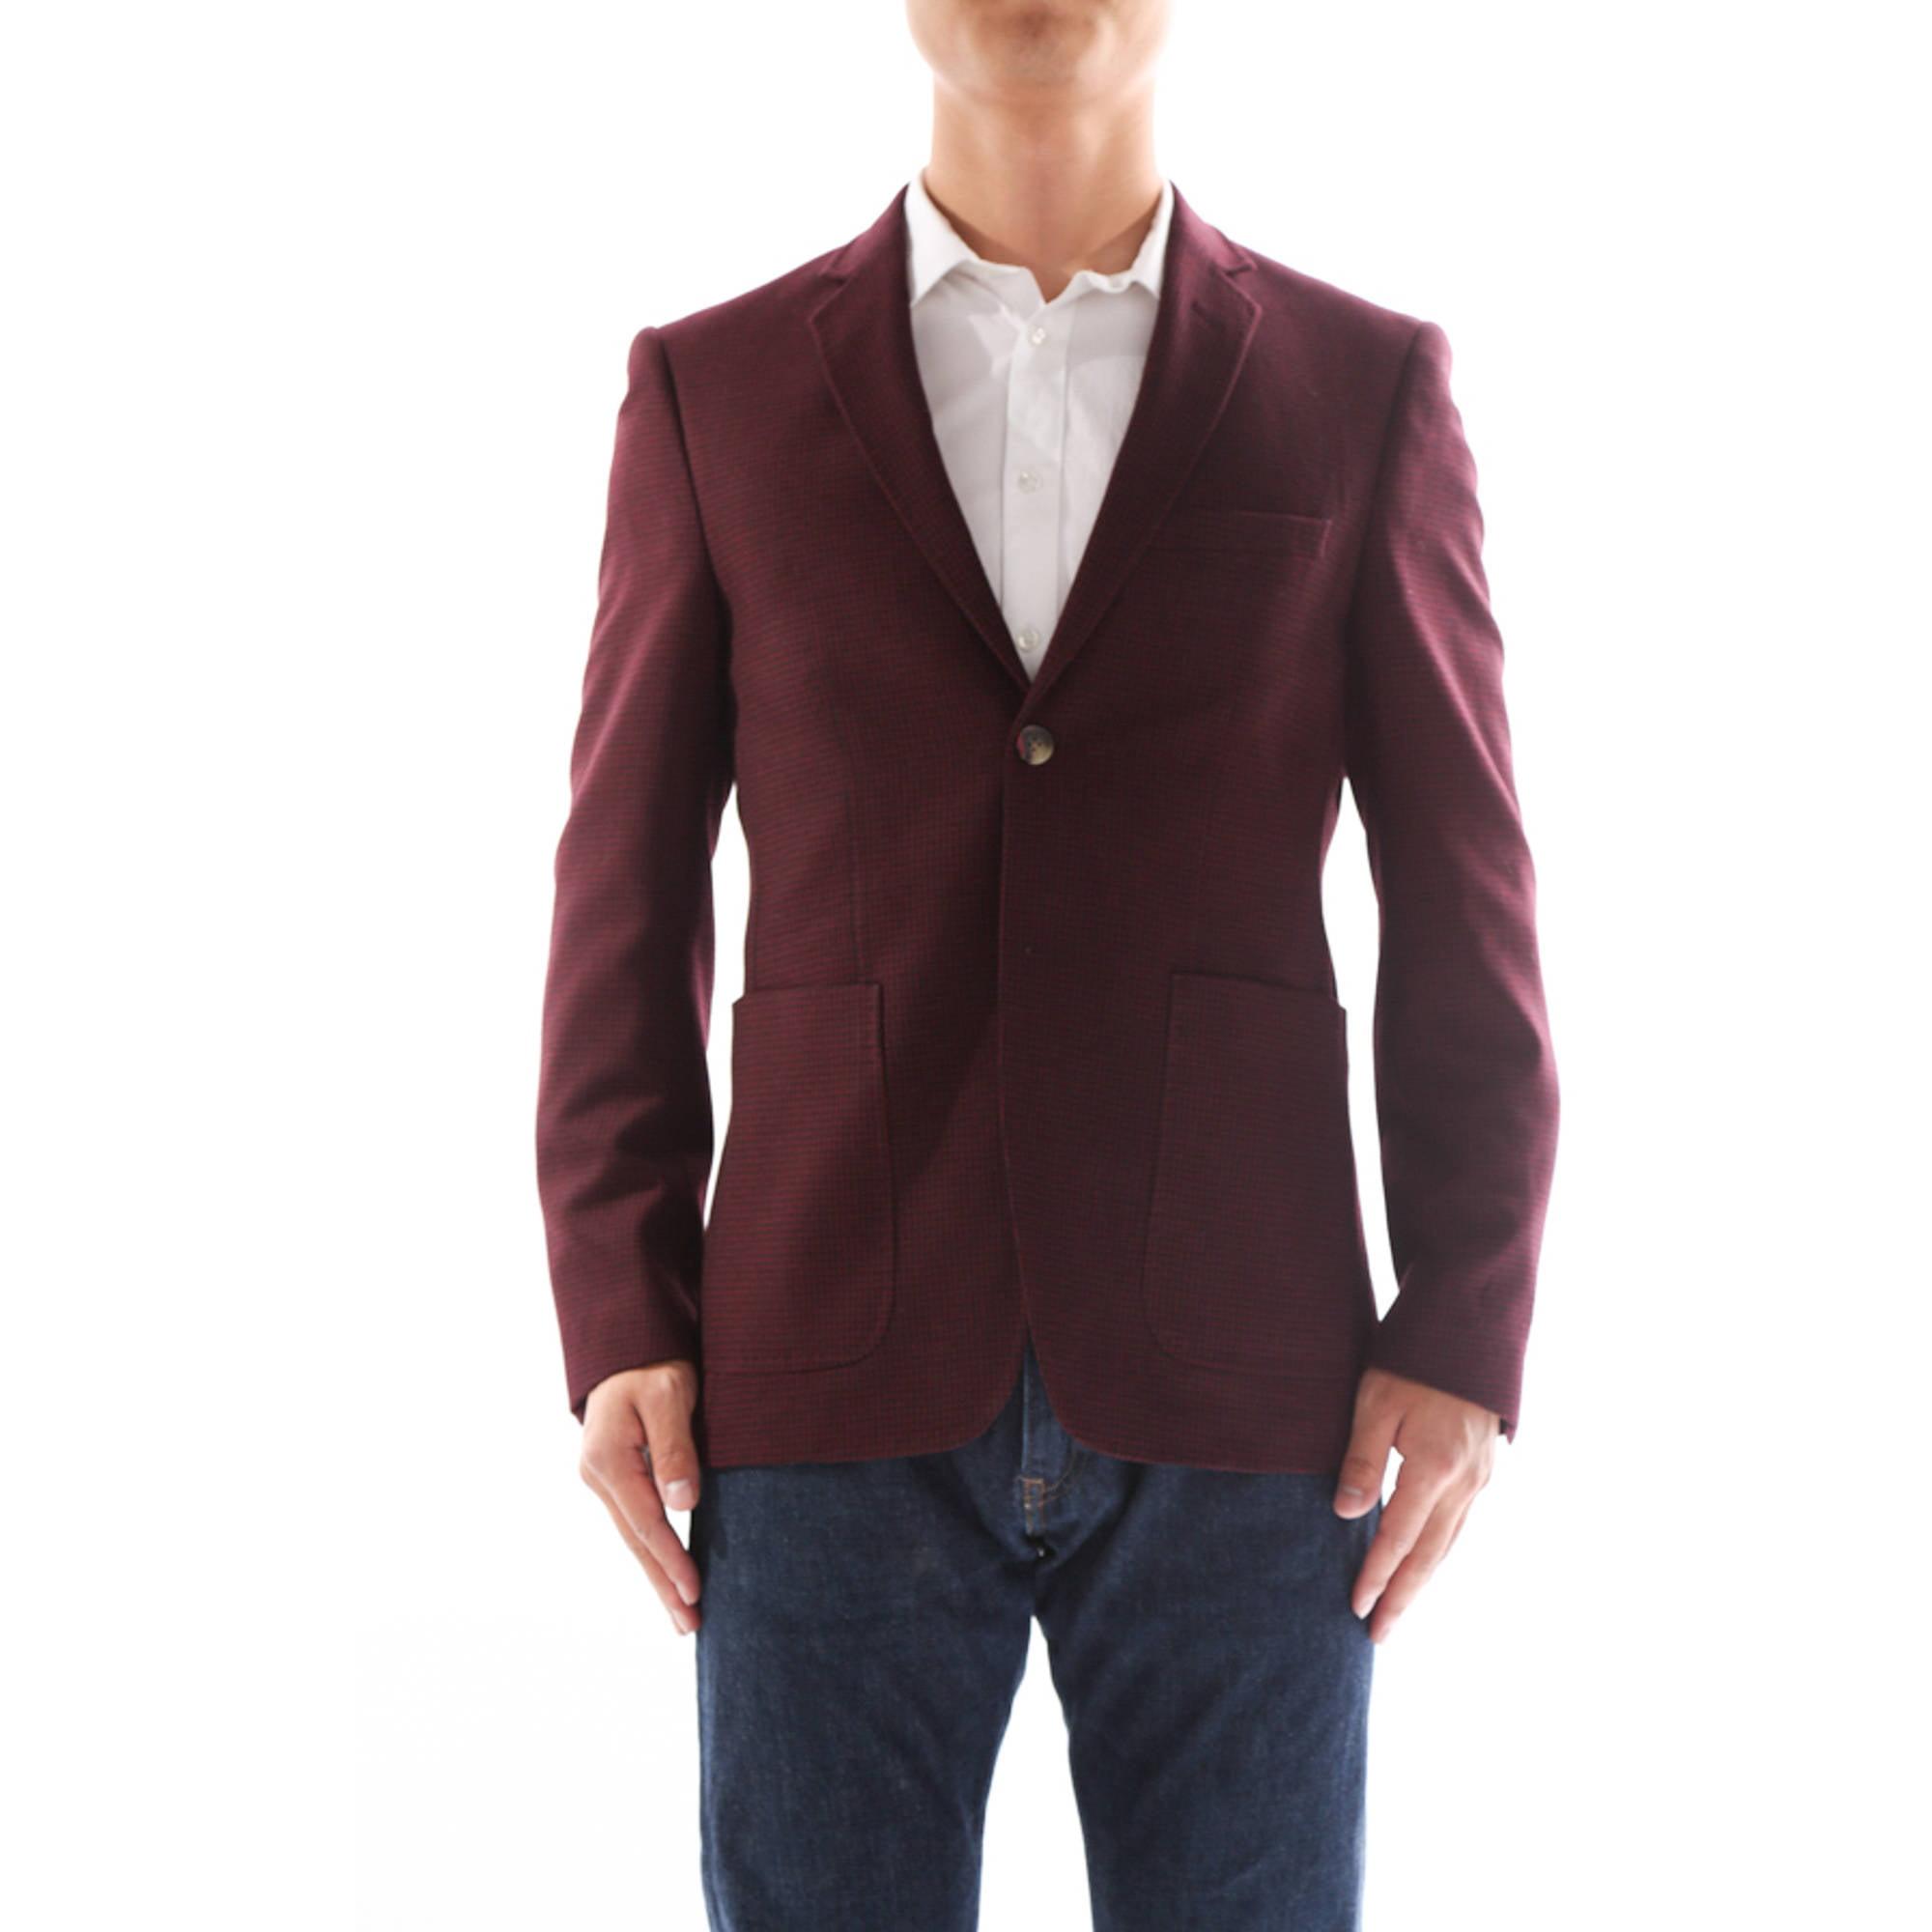 Verno Armati Men's Burgandy Slim Fit Italian Styled Wool Blazer